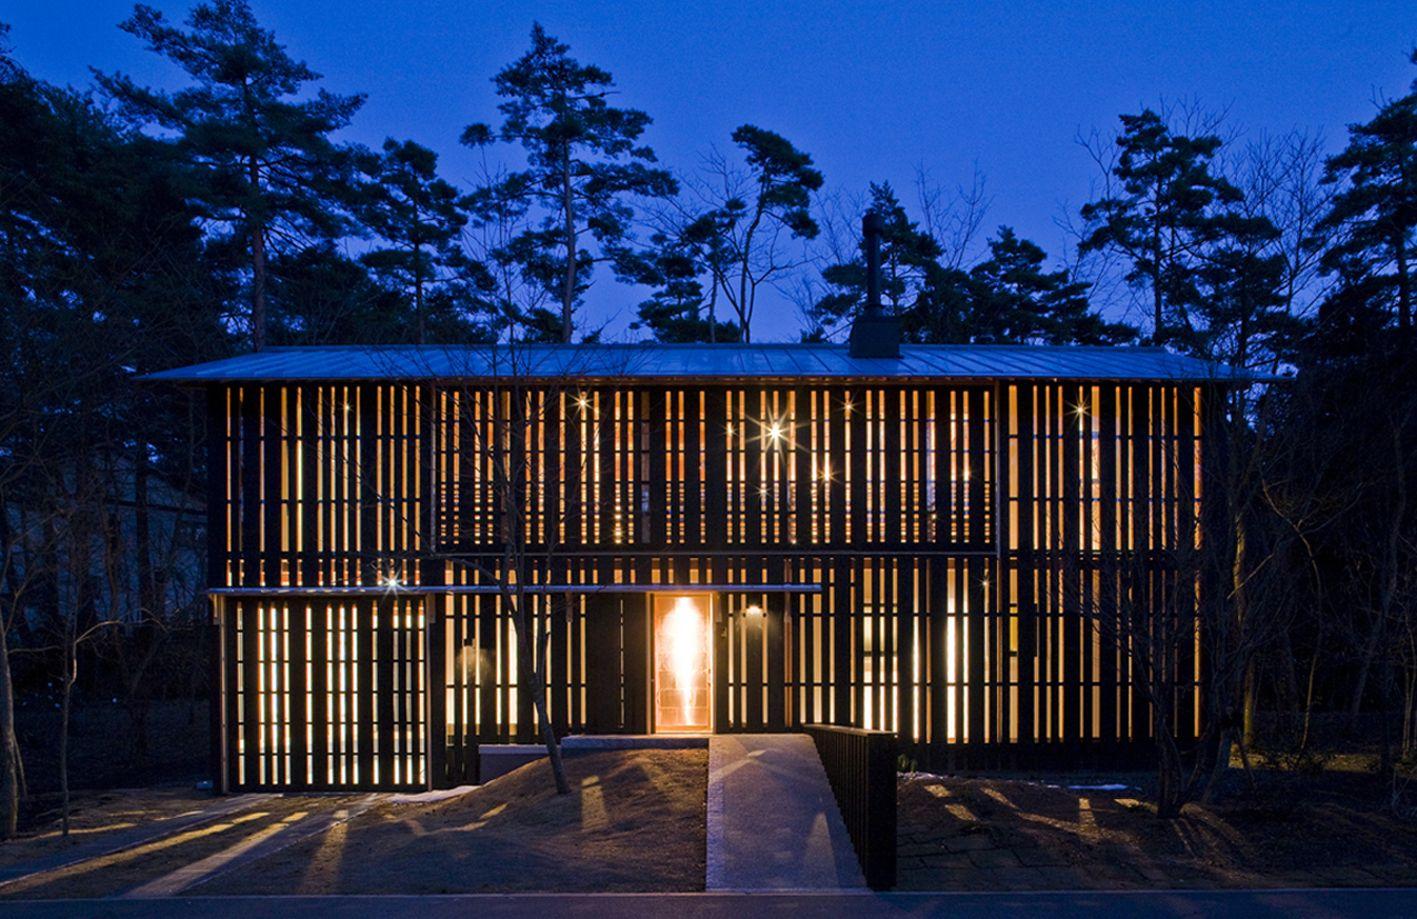 Galeria - Residência em Daisen / Osumi Yuso Architects Office - 31